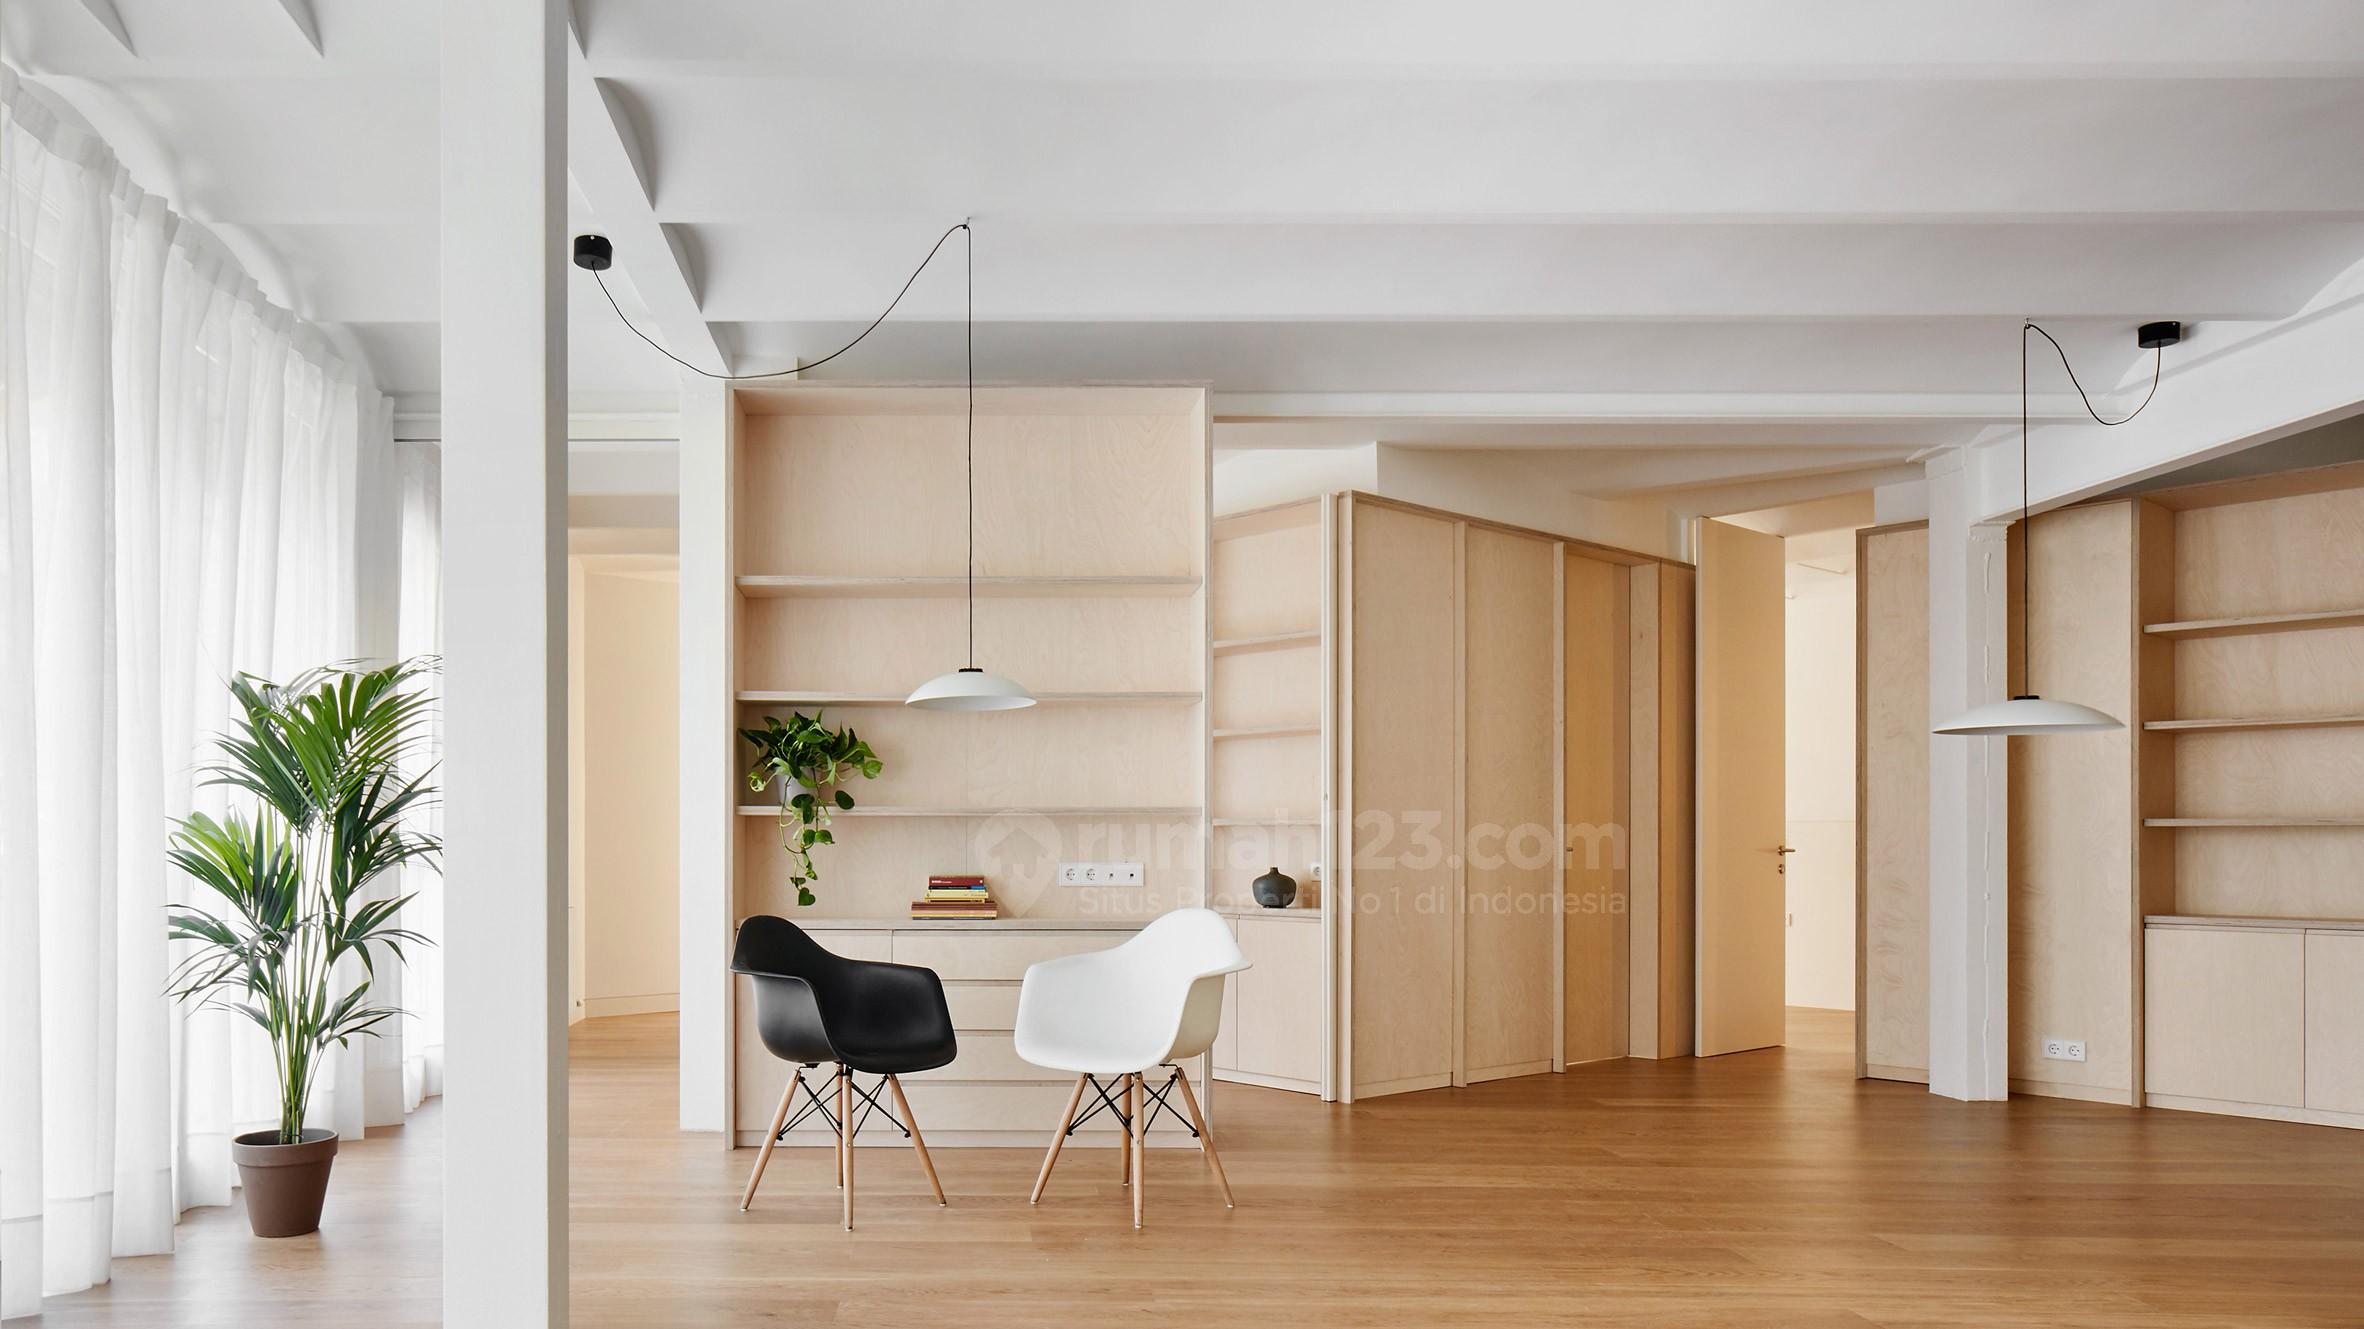 bajet-girame-architects